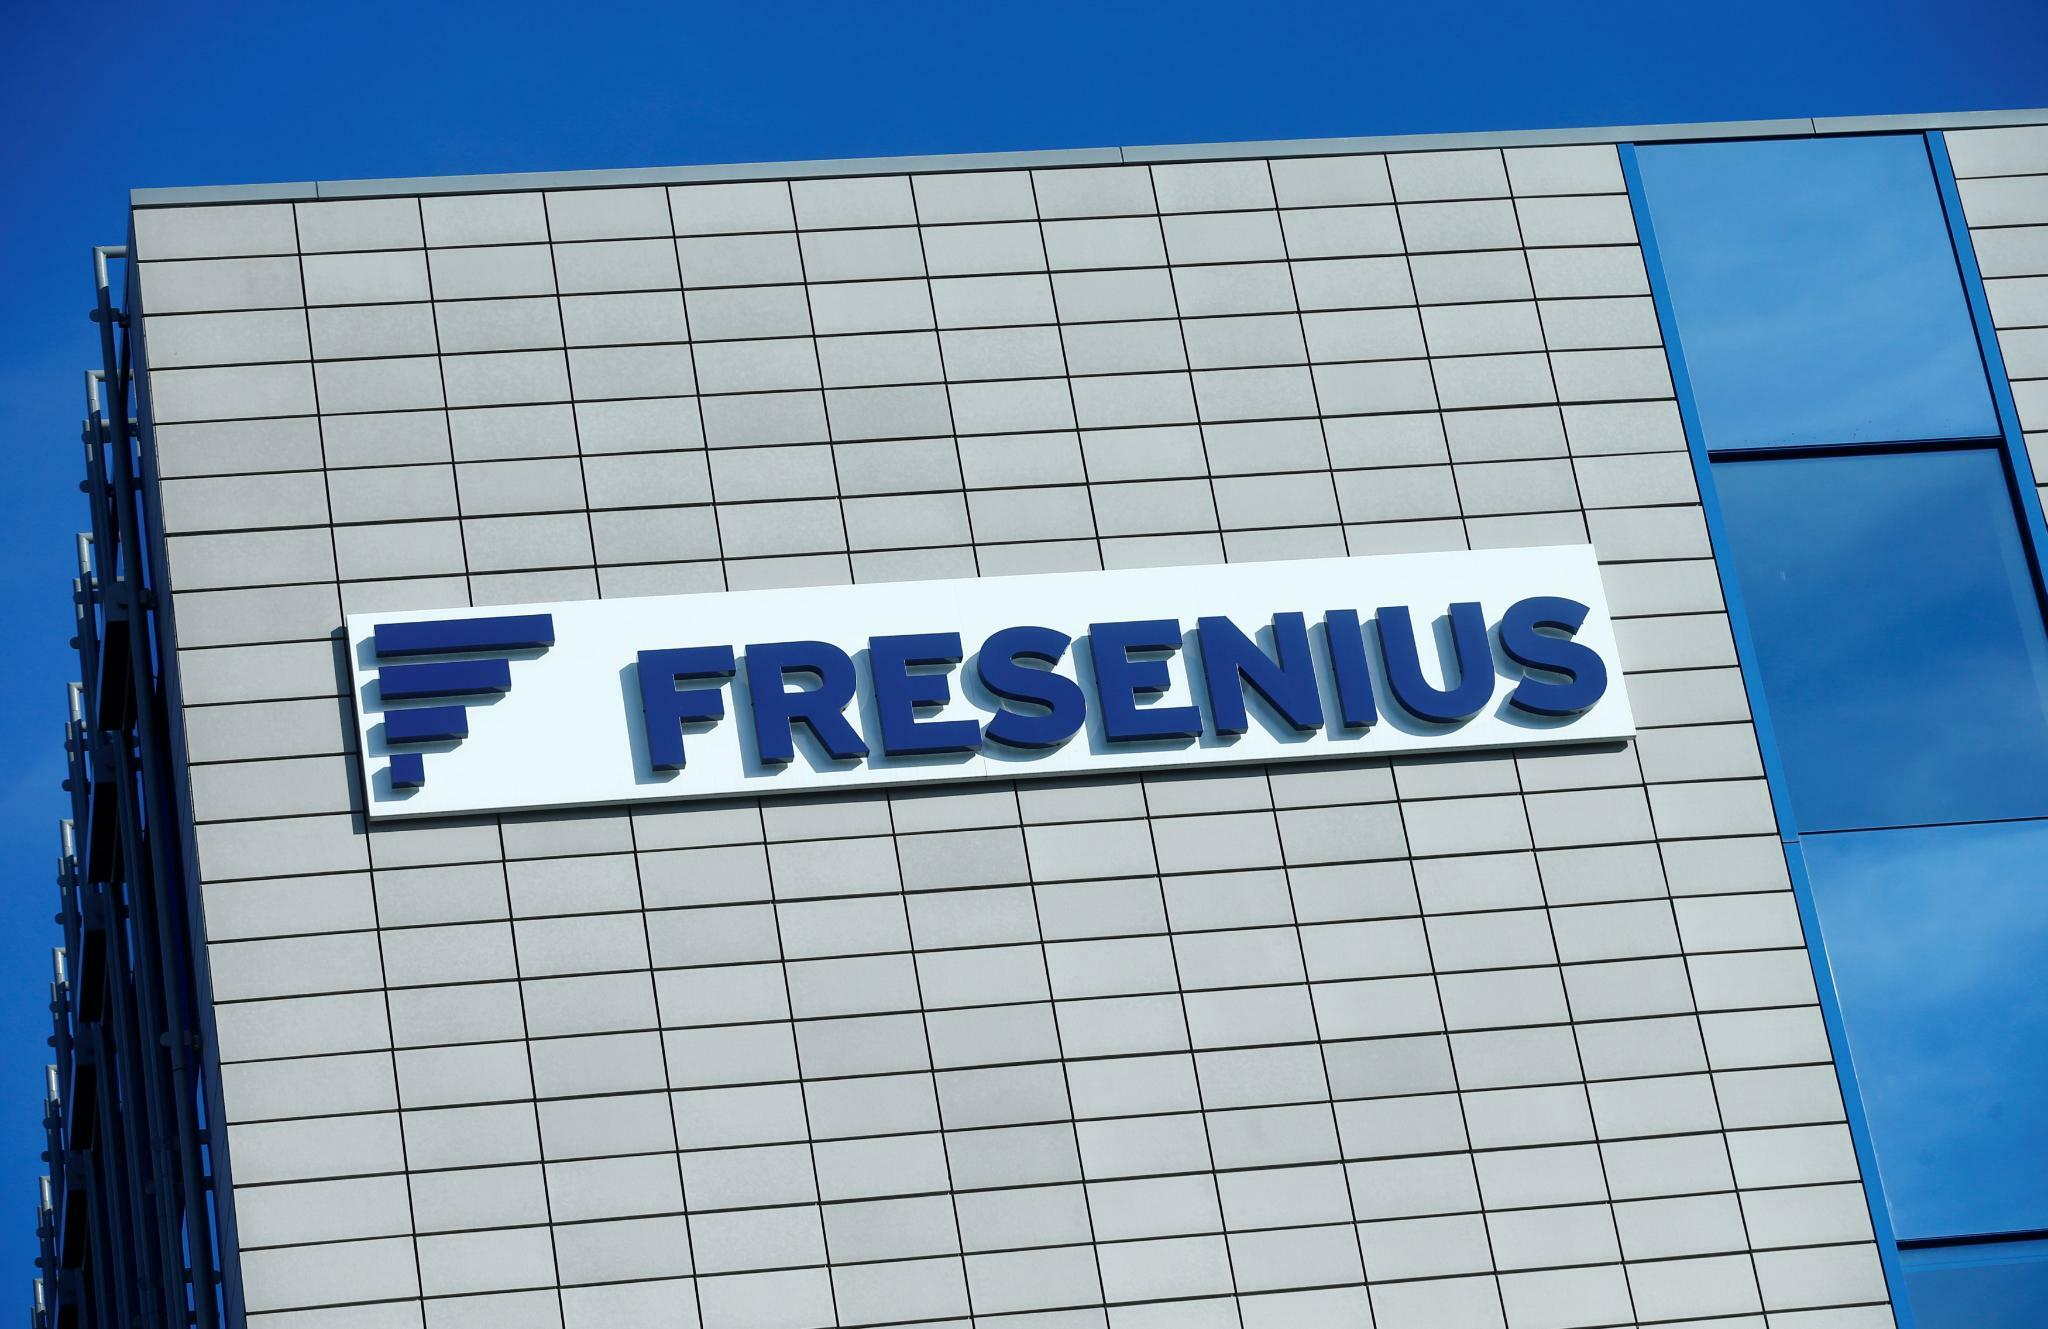 Medizintechnik-Konzern: Fresenius behält Sparte Transfusionsmedizin im Konzern